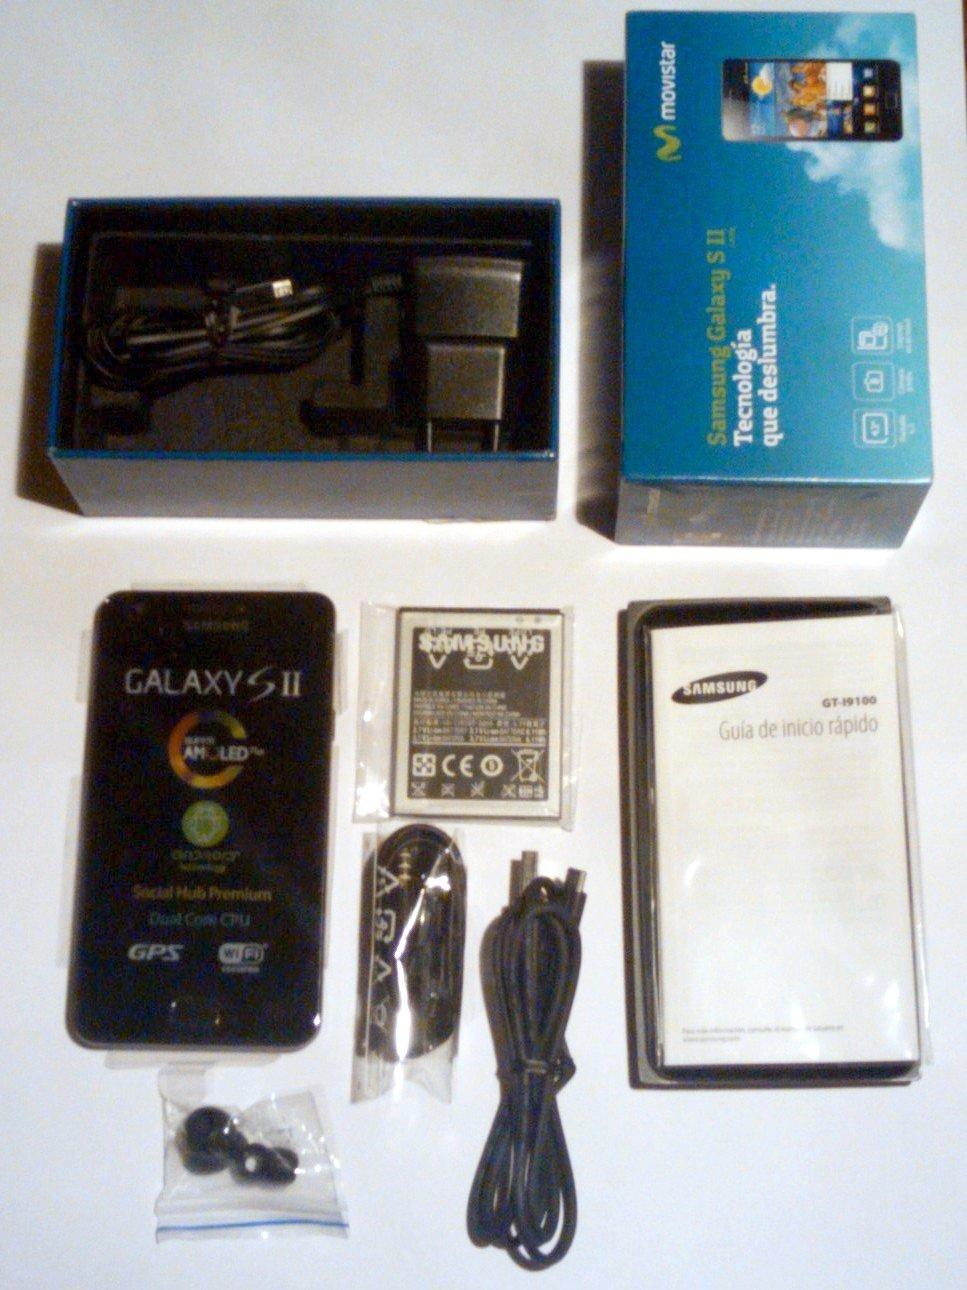 Samsung Galaxy S2 - Movistar Spain